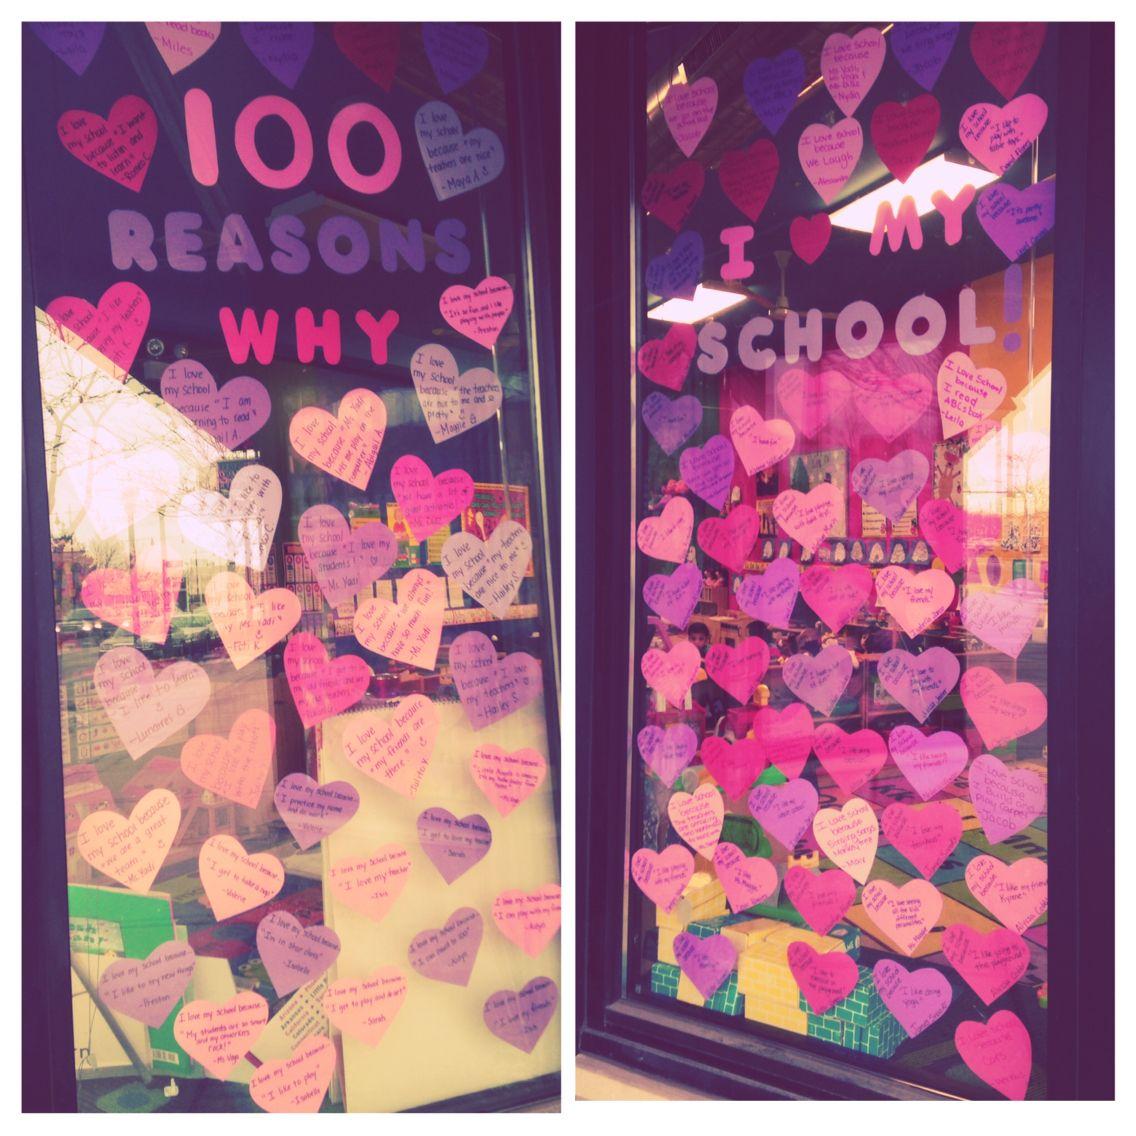 100 Reasons Why I Love My School